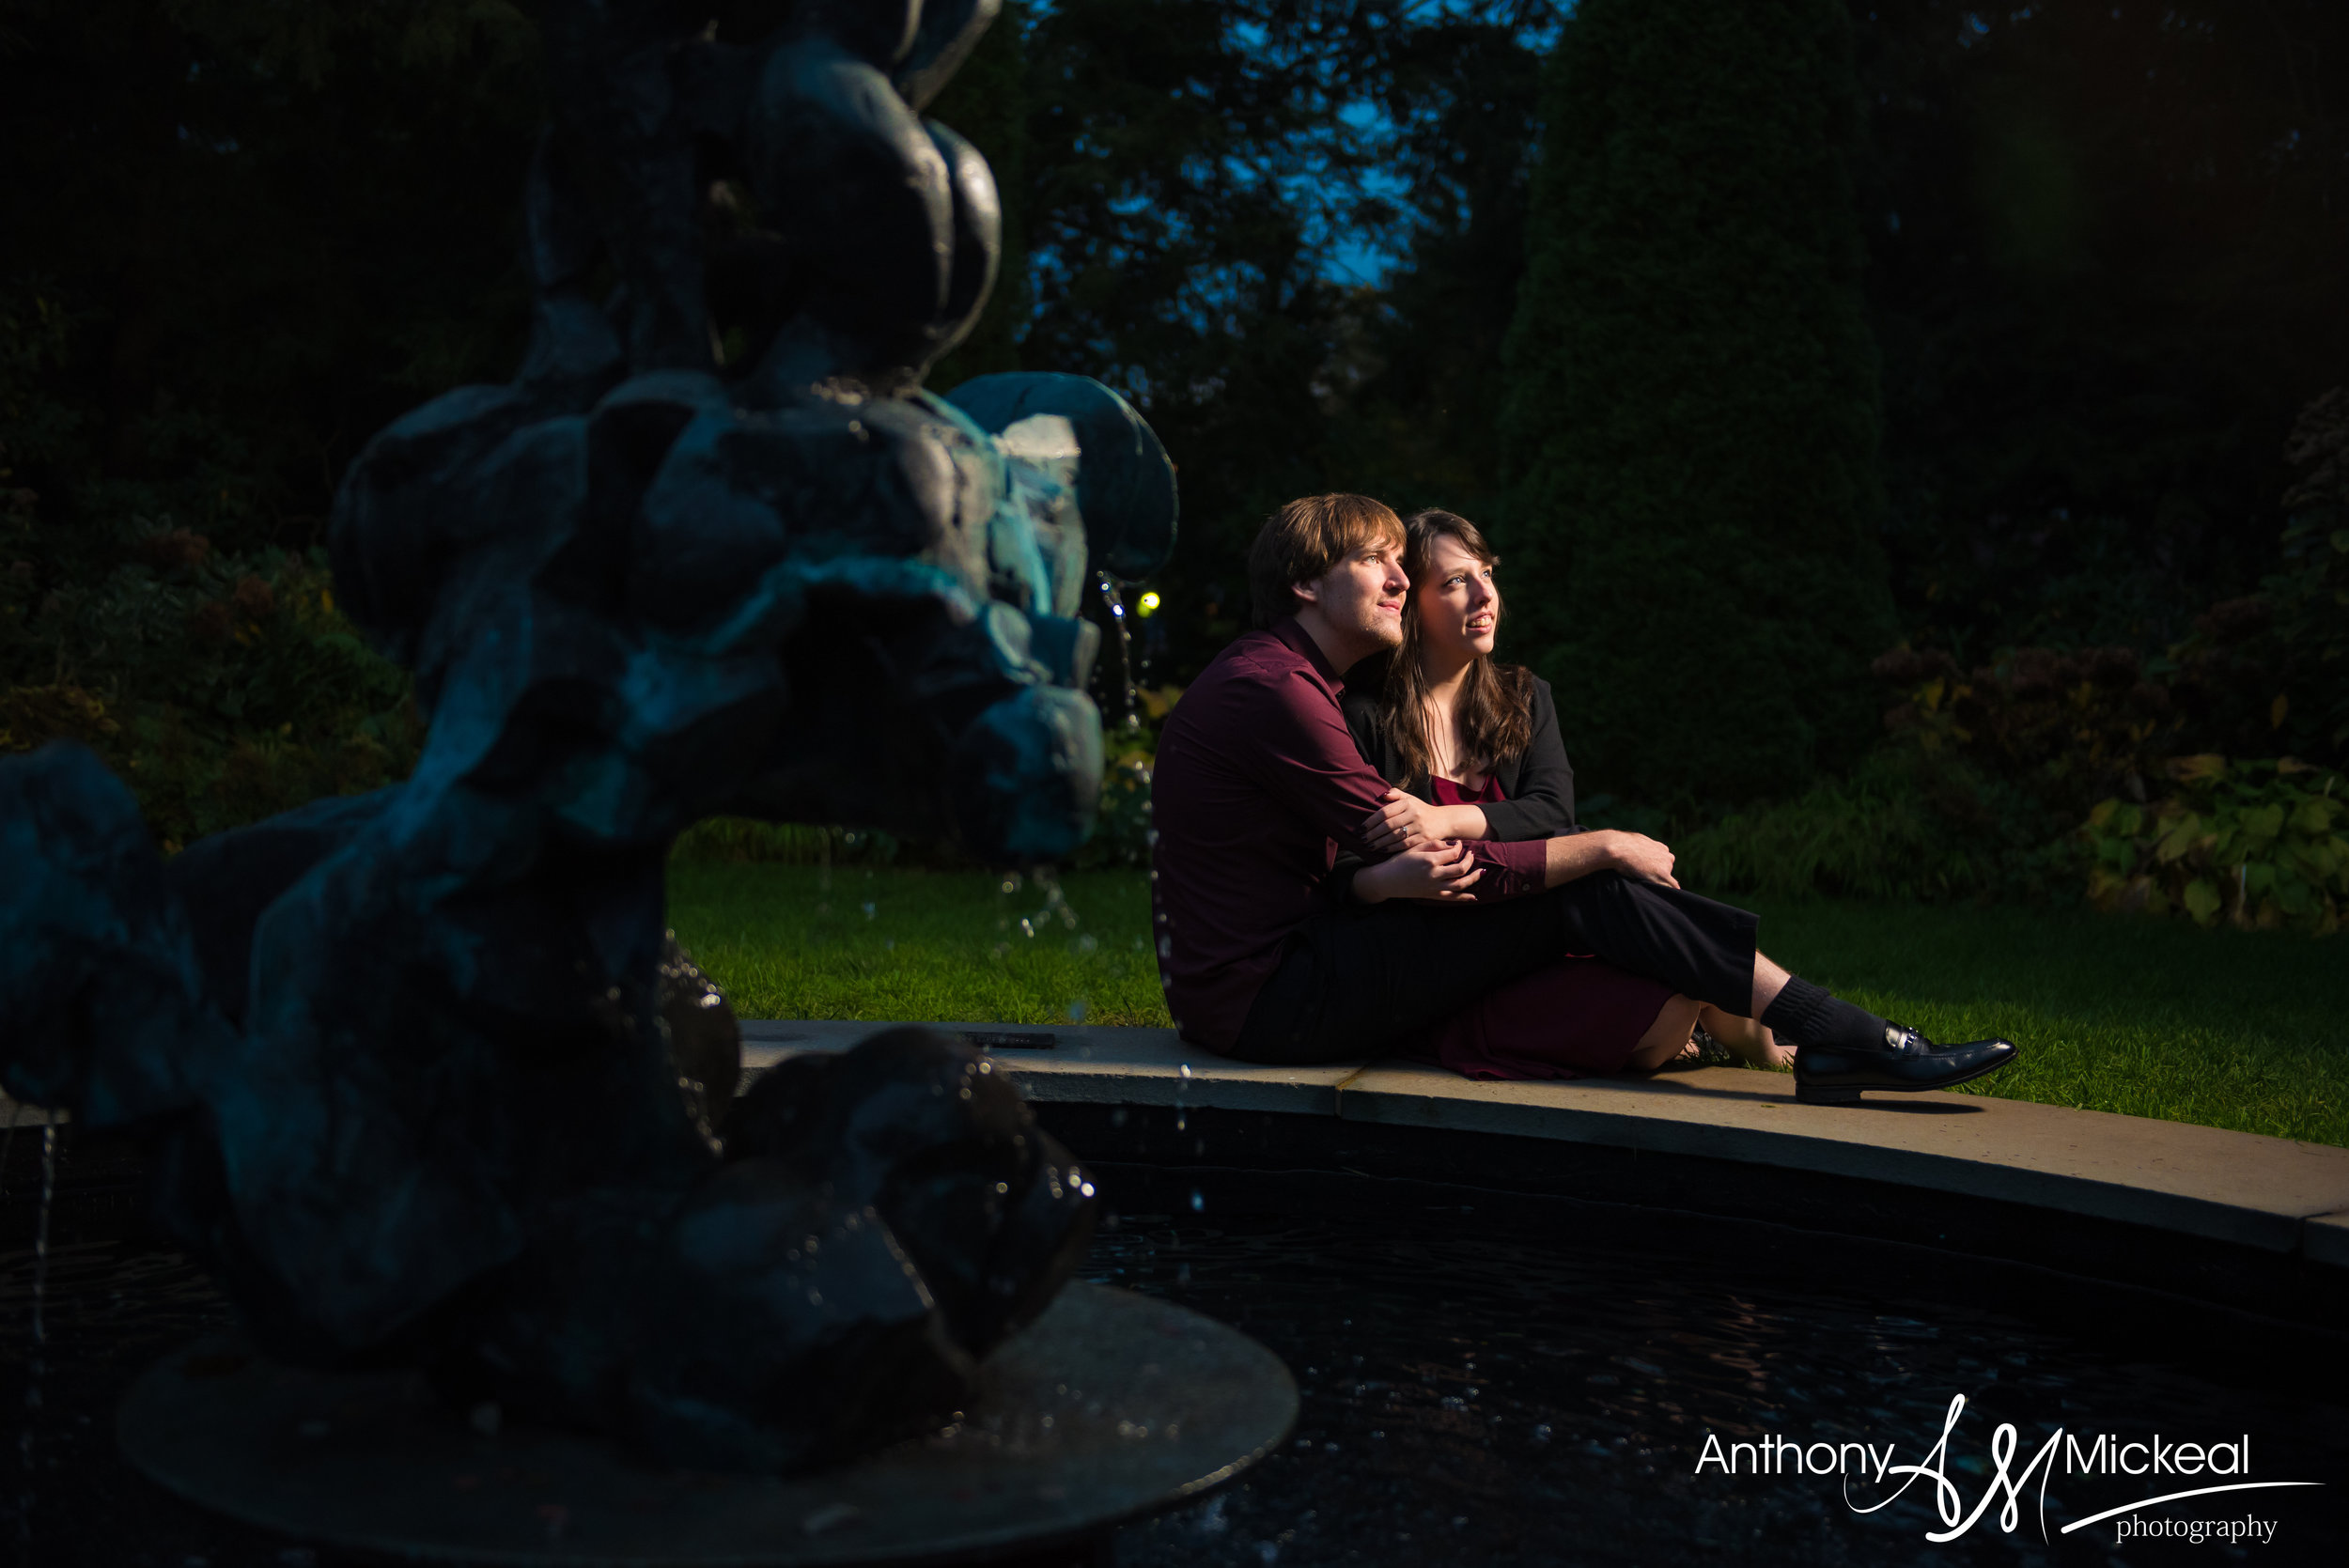 Princeton NJ wedding photographer photography 4356.jpg